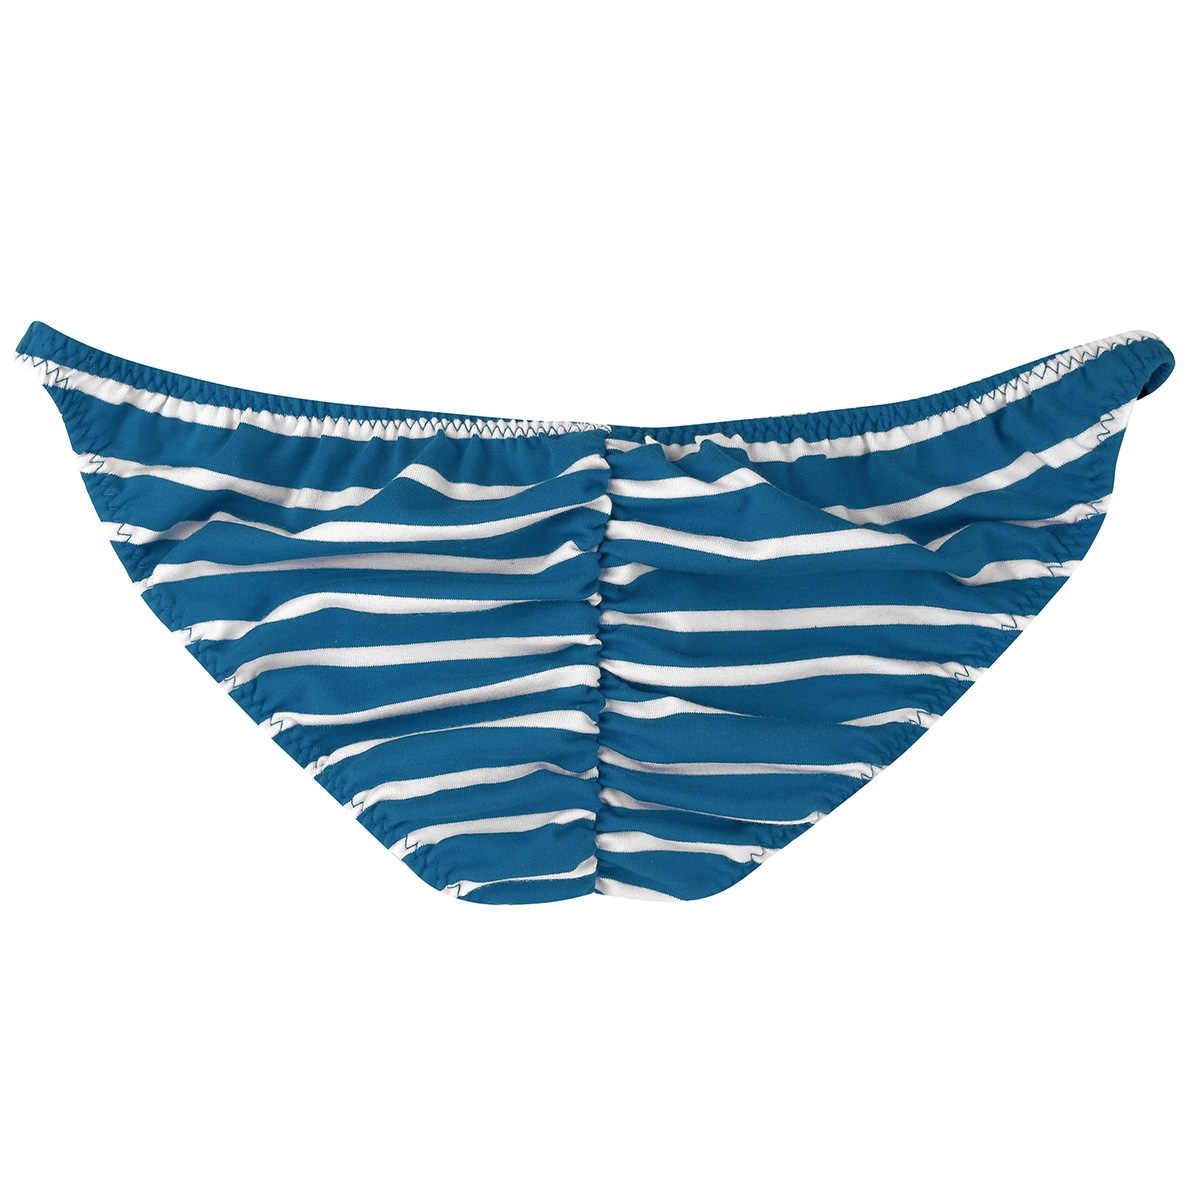 a4dae3b7477dd9 ... Men's Low Rise Briefs Sexy Men Underwear Lingerie Sissy Panties Stripes  Pattern Bulge Pouch Stretchy Men ...